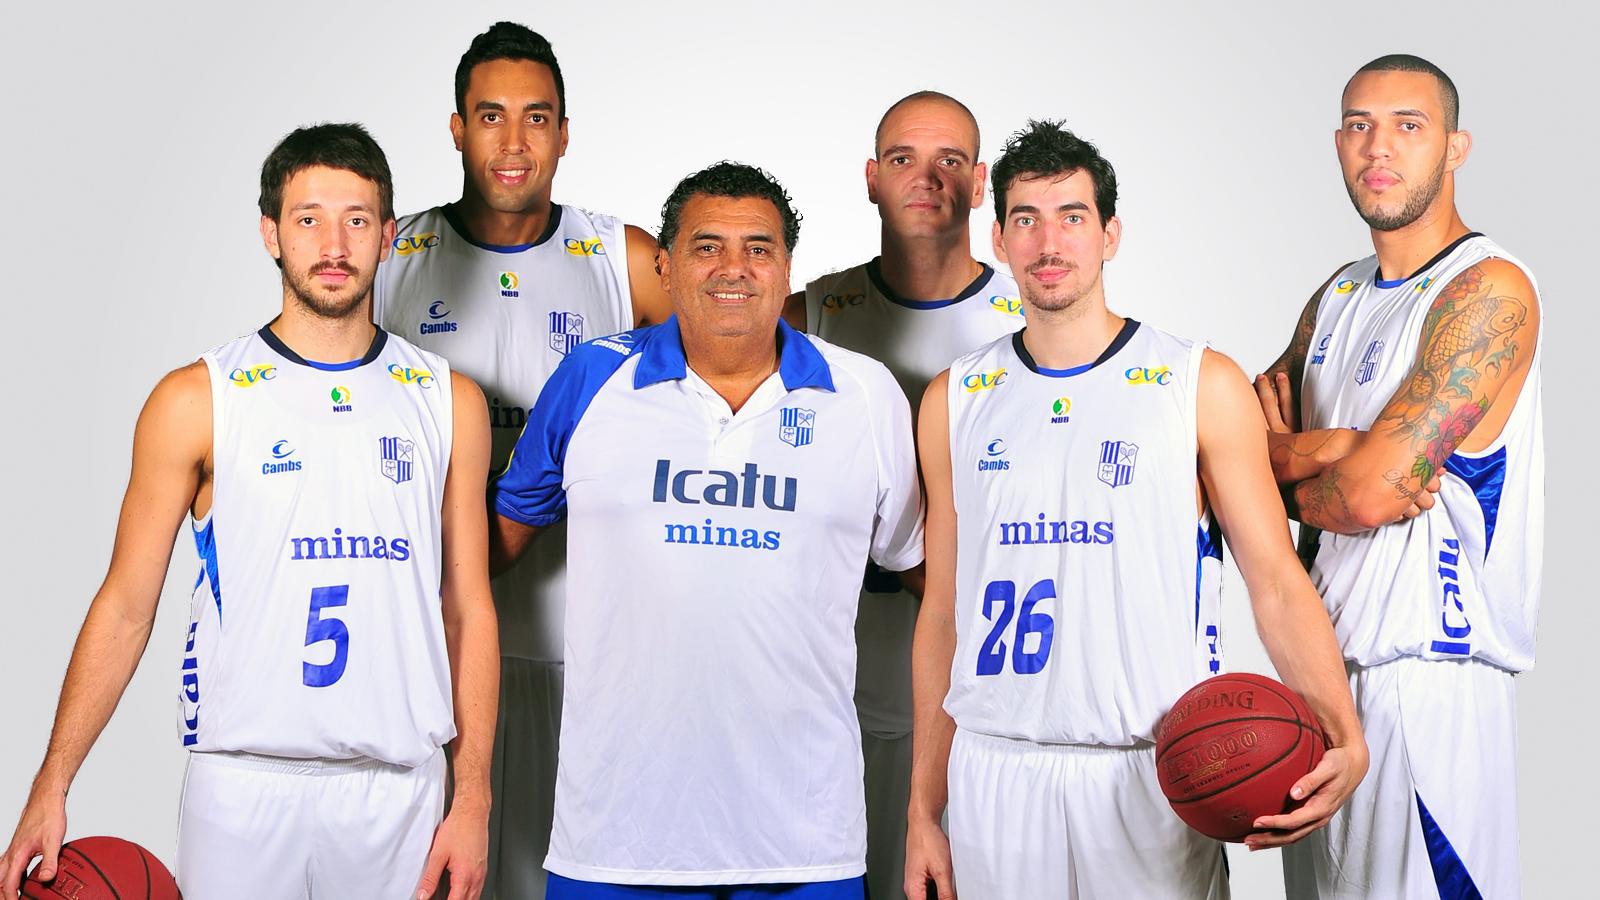 Equipe Minas